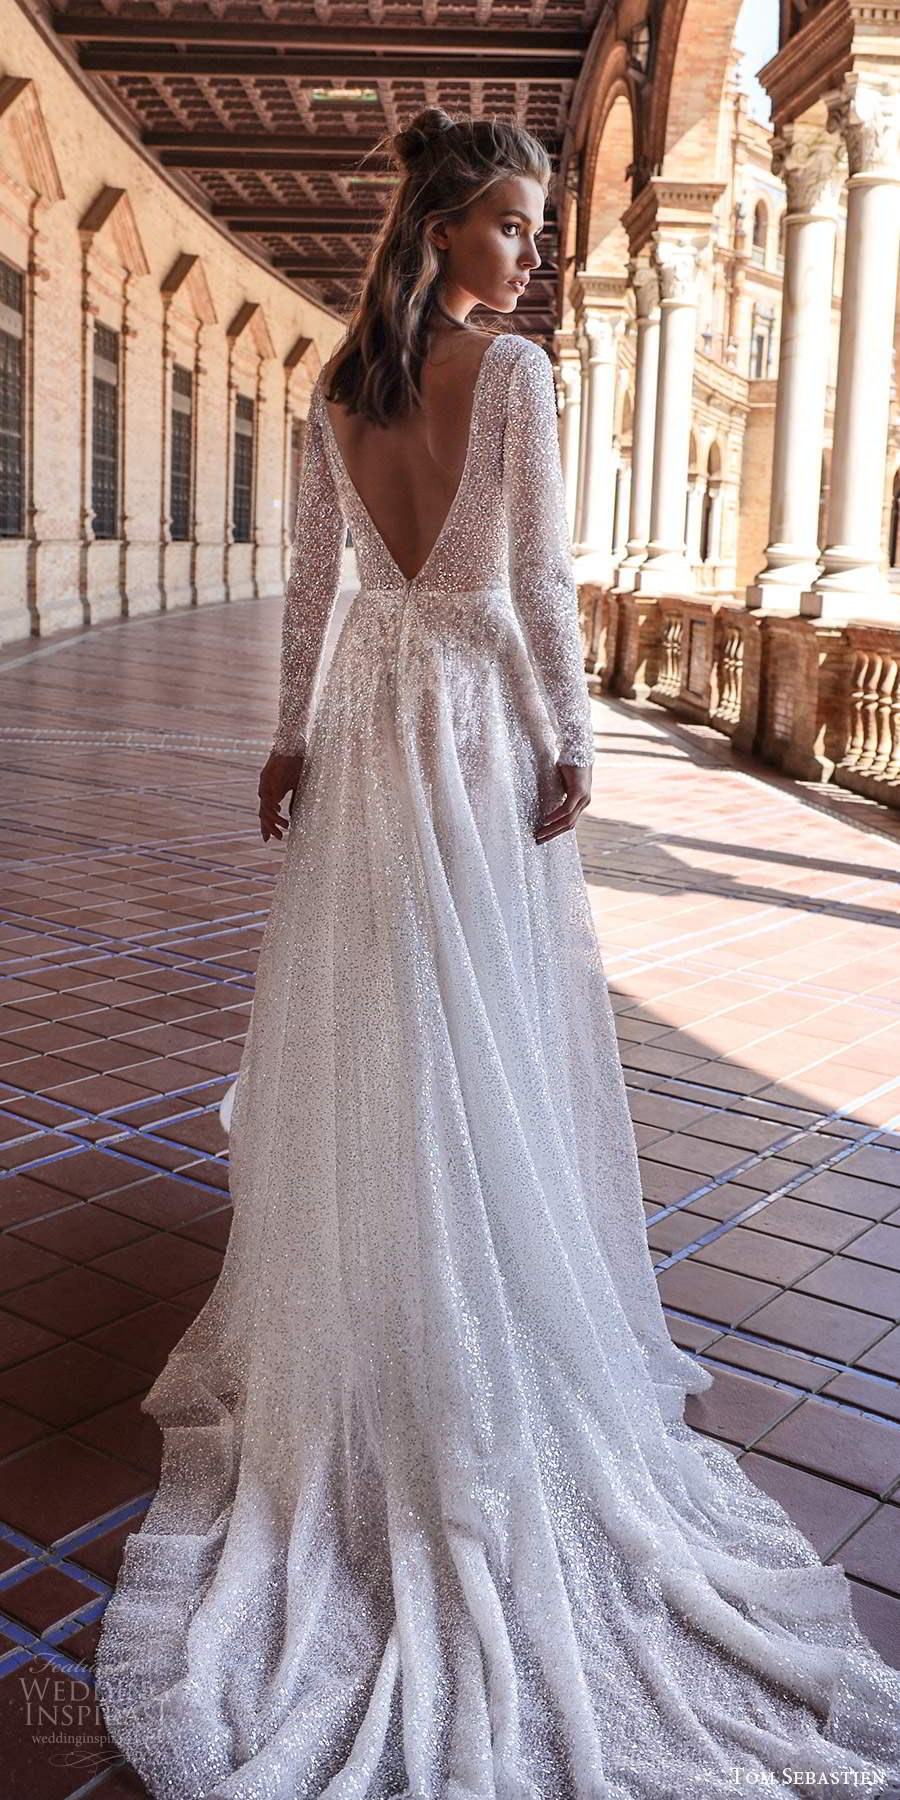 tom sebastien 2021 bridal long sleeve plunging v neckline fully embellished glitzy a line wedding dress chapel train (12) bv